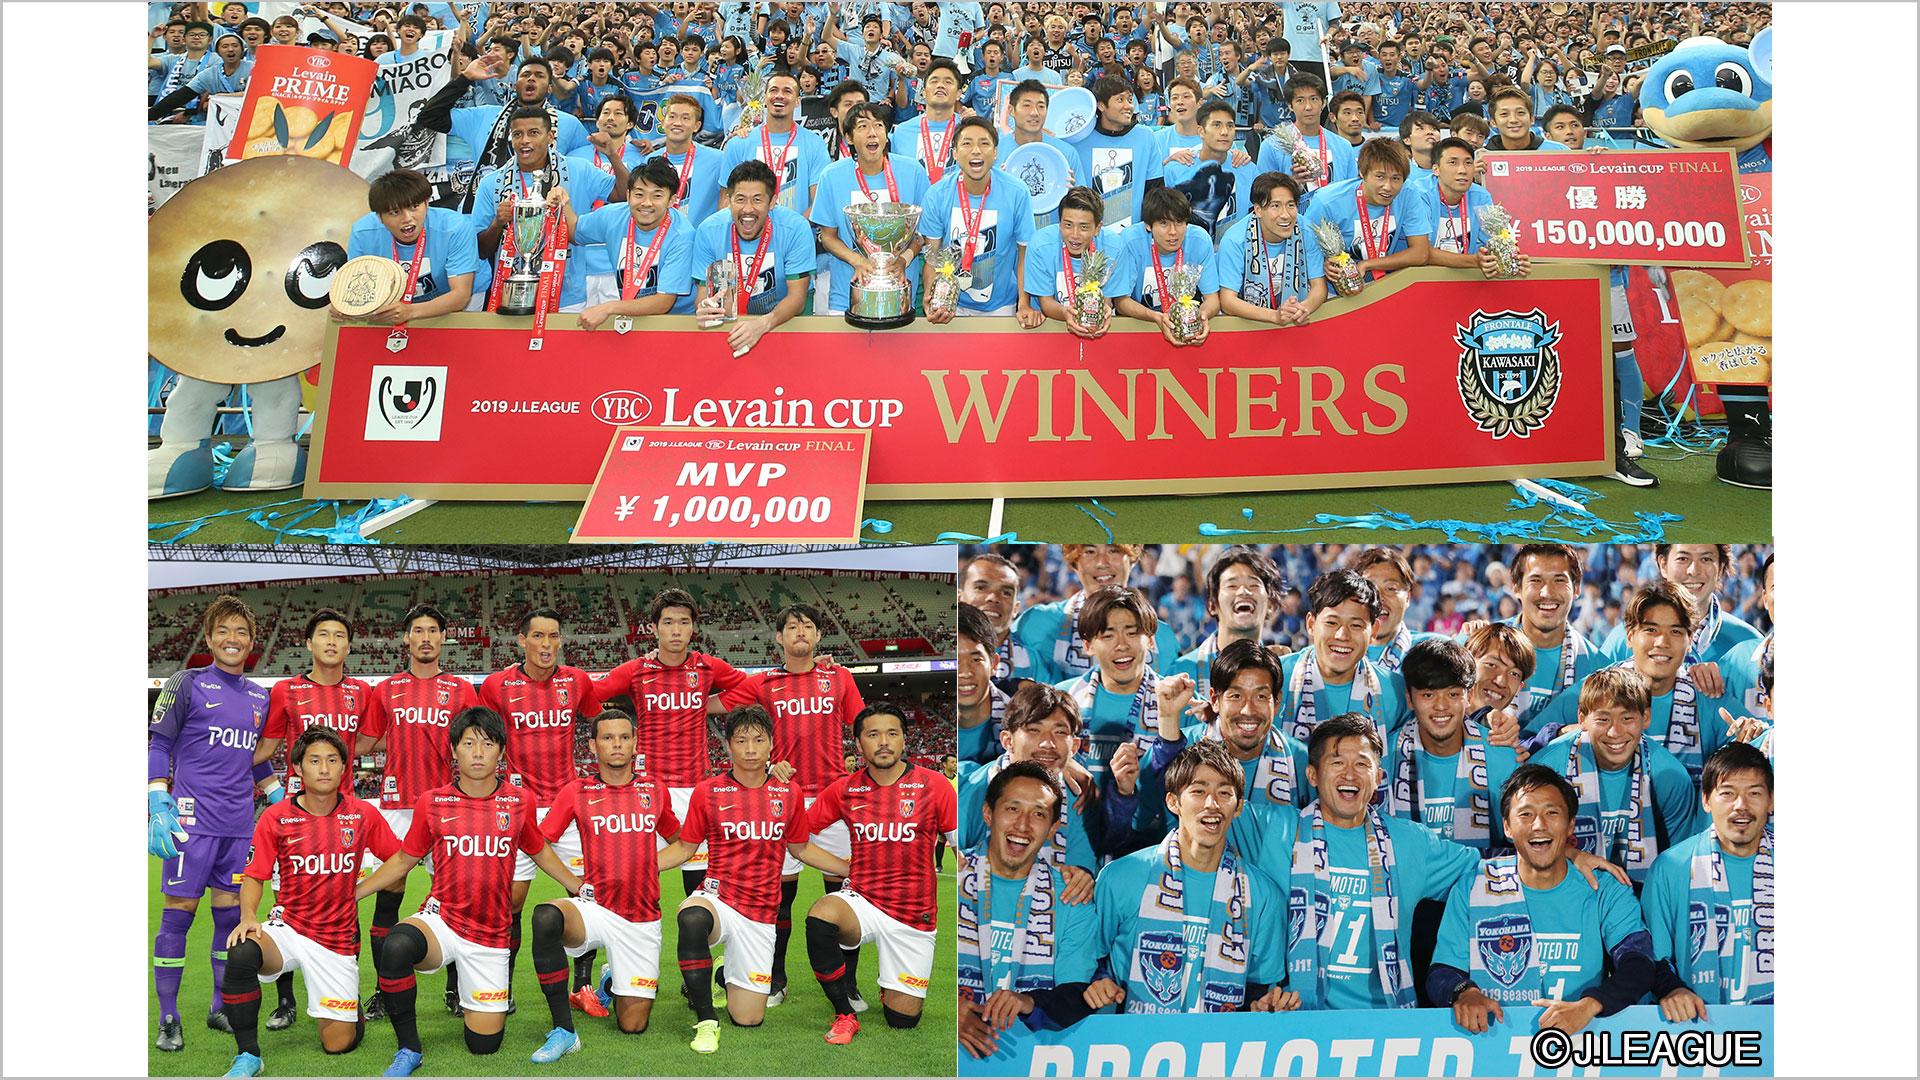 2020 JリーグYBCルヴァンカップ グループステージ 第2節 Dグループ 大分トリニータ vs ガンバ大阪